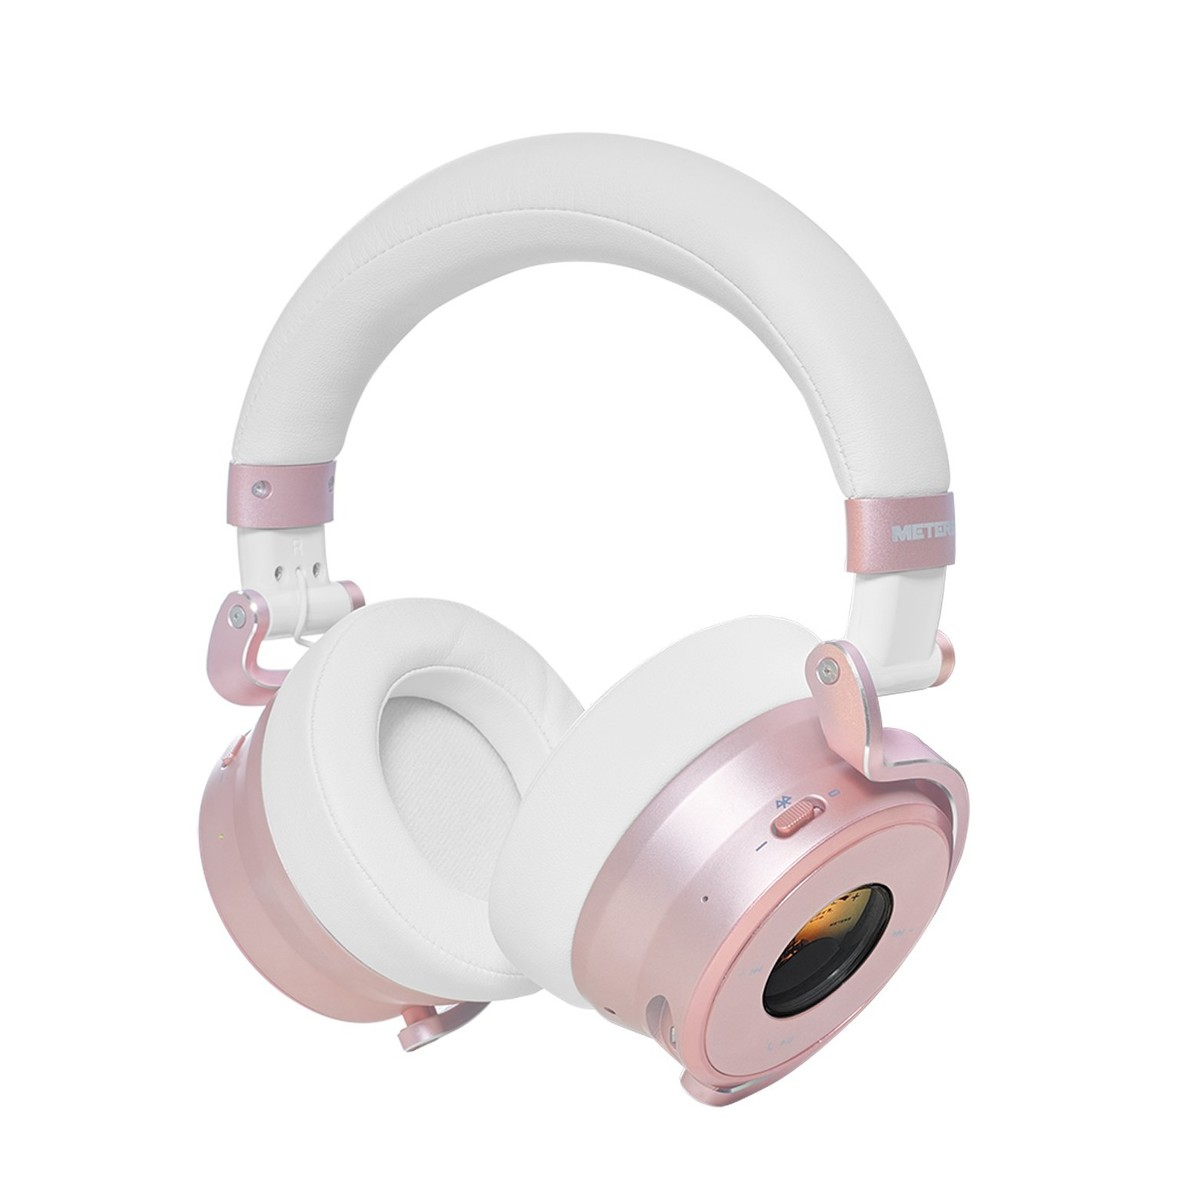 d93efe1fcac Meter OV-1-B Bluetooth Over Ear Headphones, Rose Gold - Main. Loading zoom